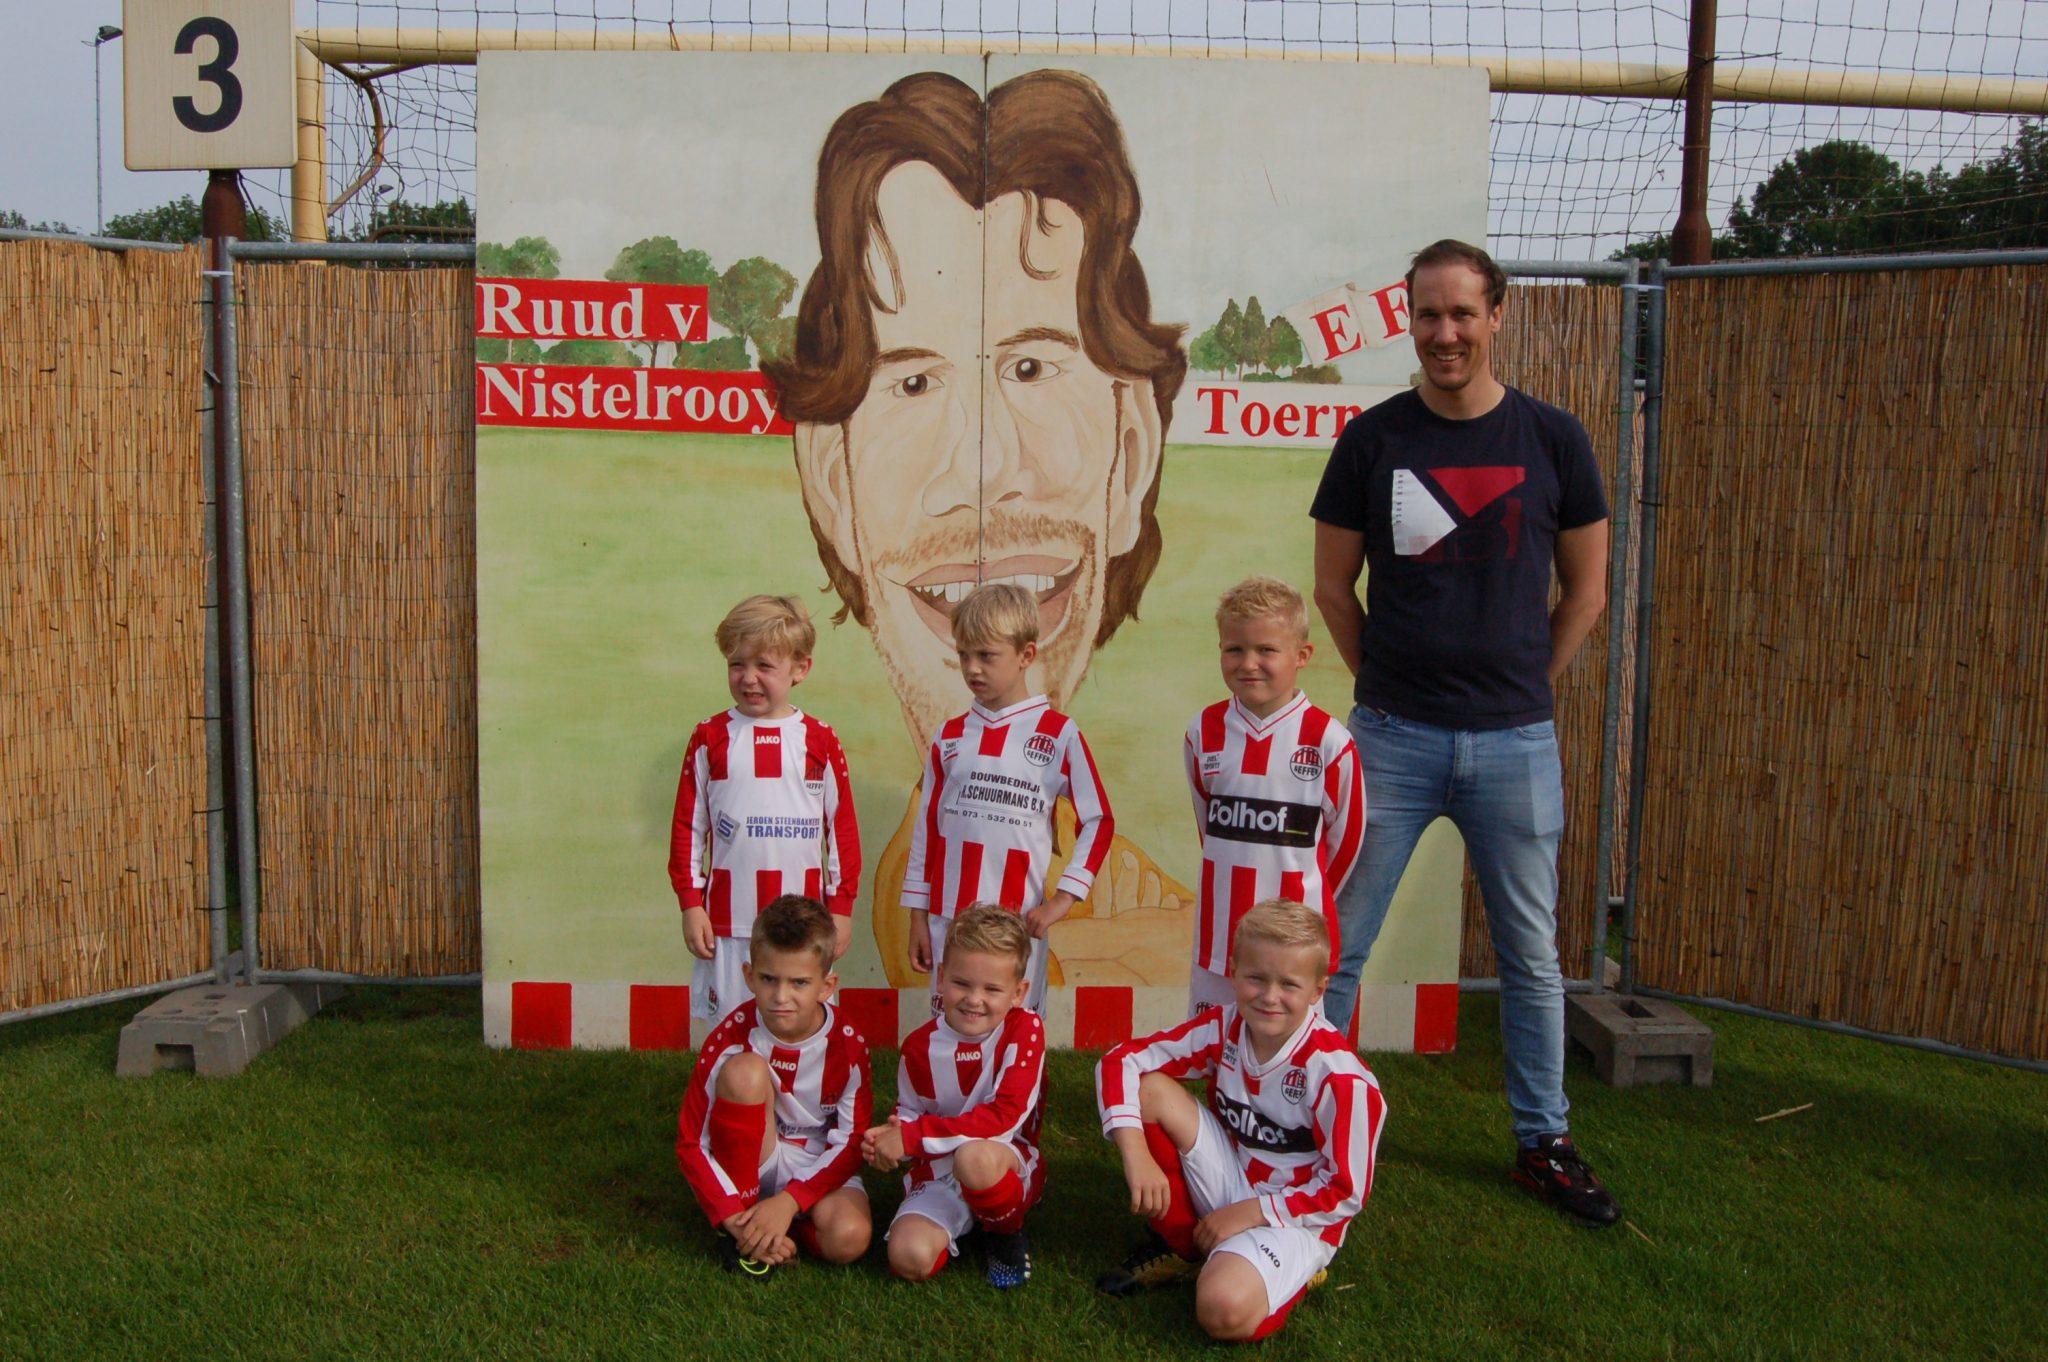 Fotoverslag Ruud van Nistelrooy pupillentoernooi